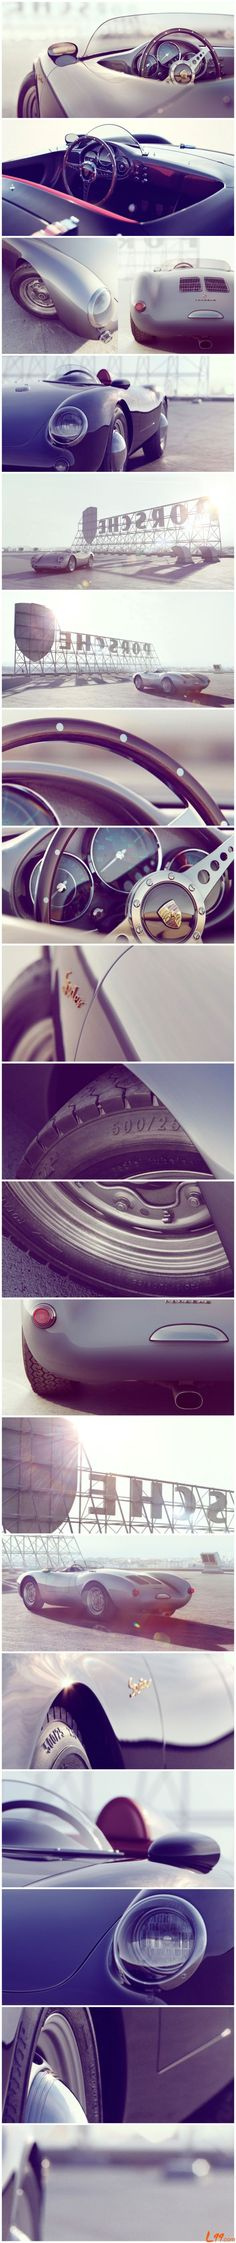 Porsche 550 real classic.